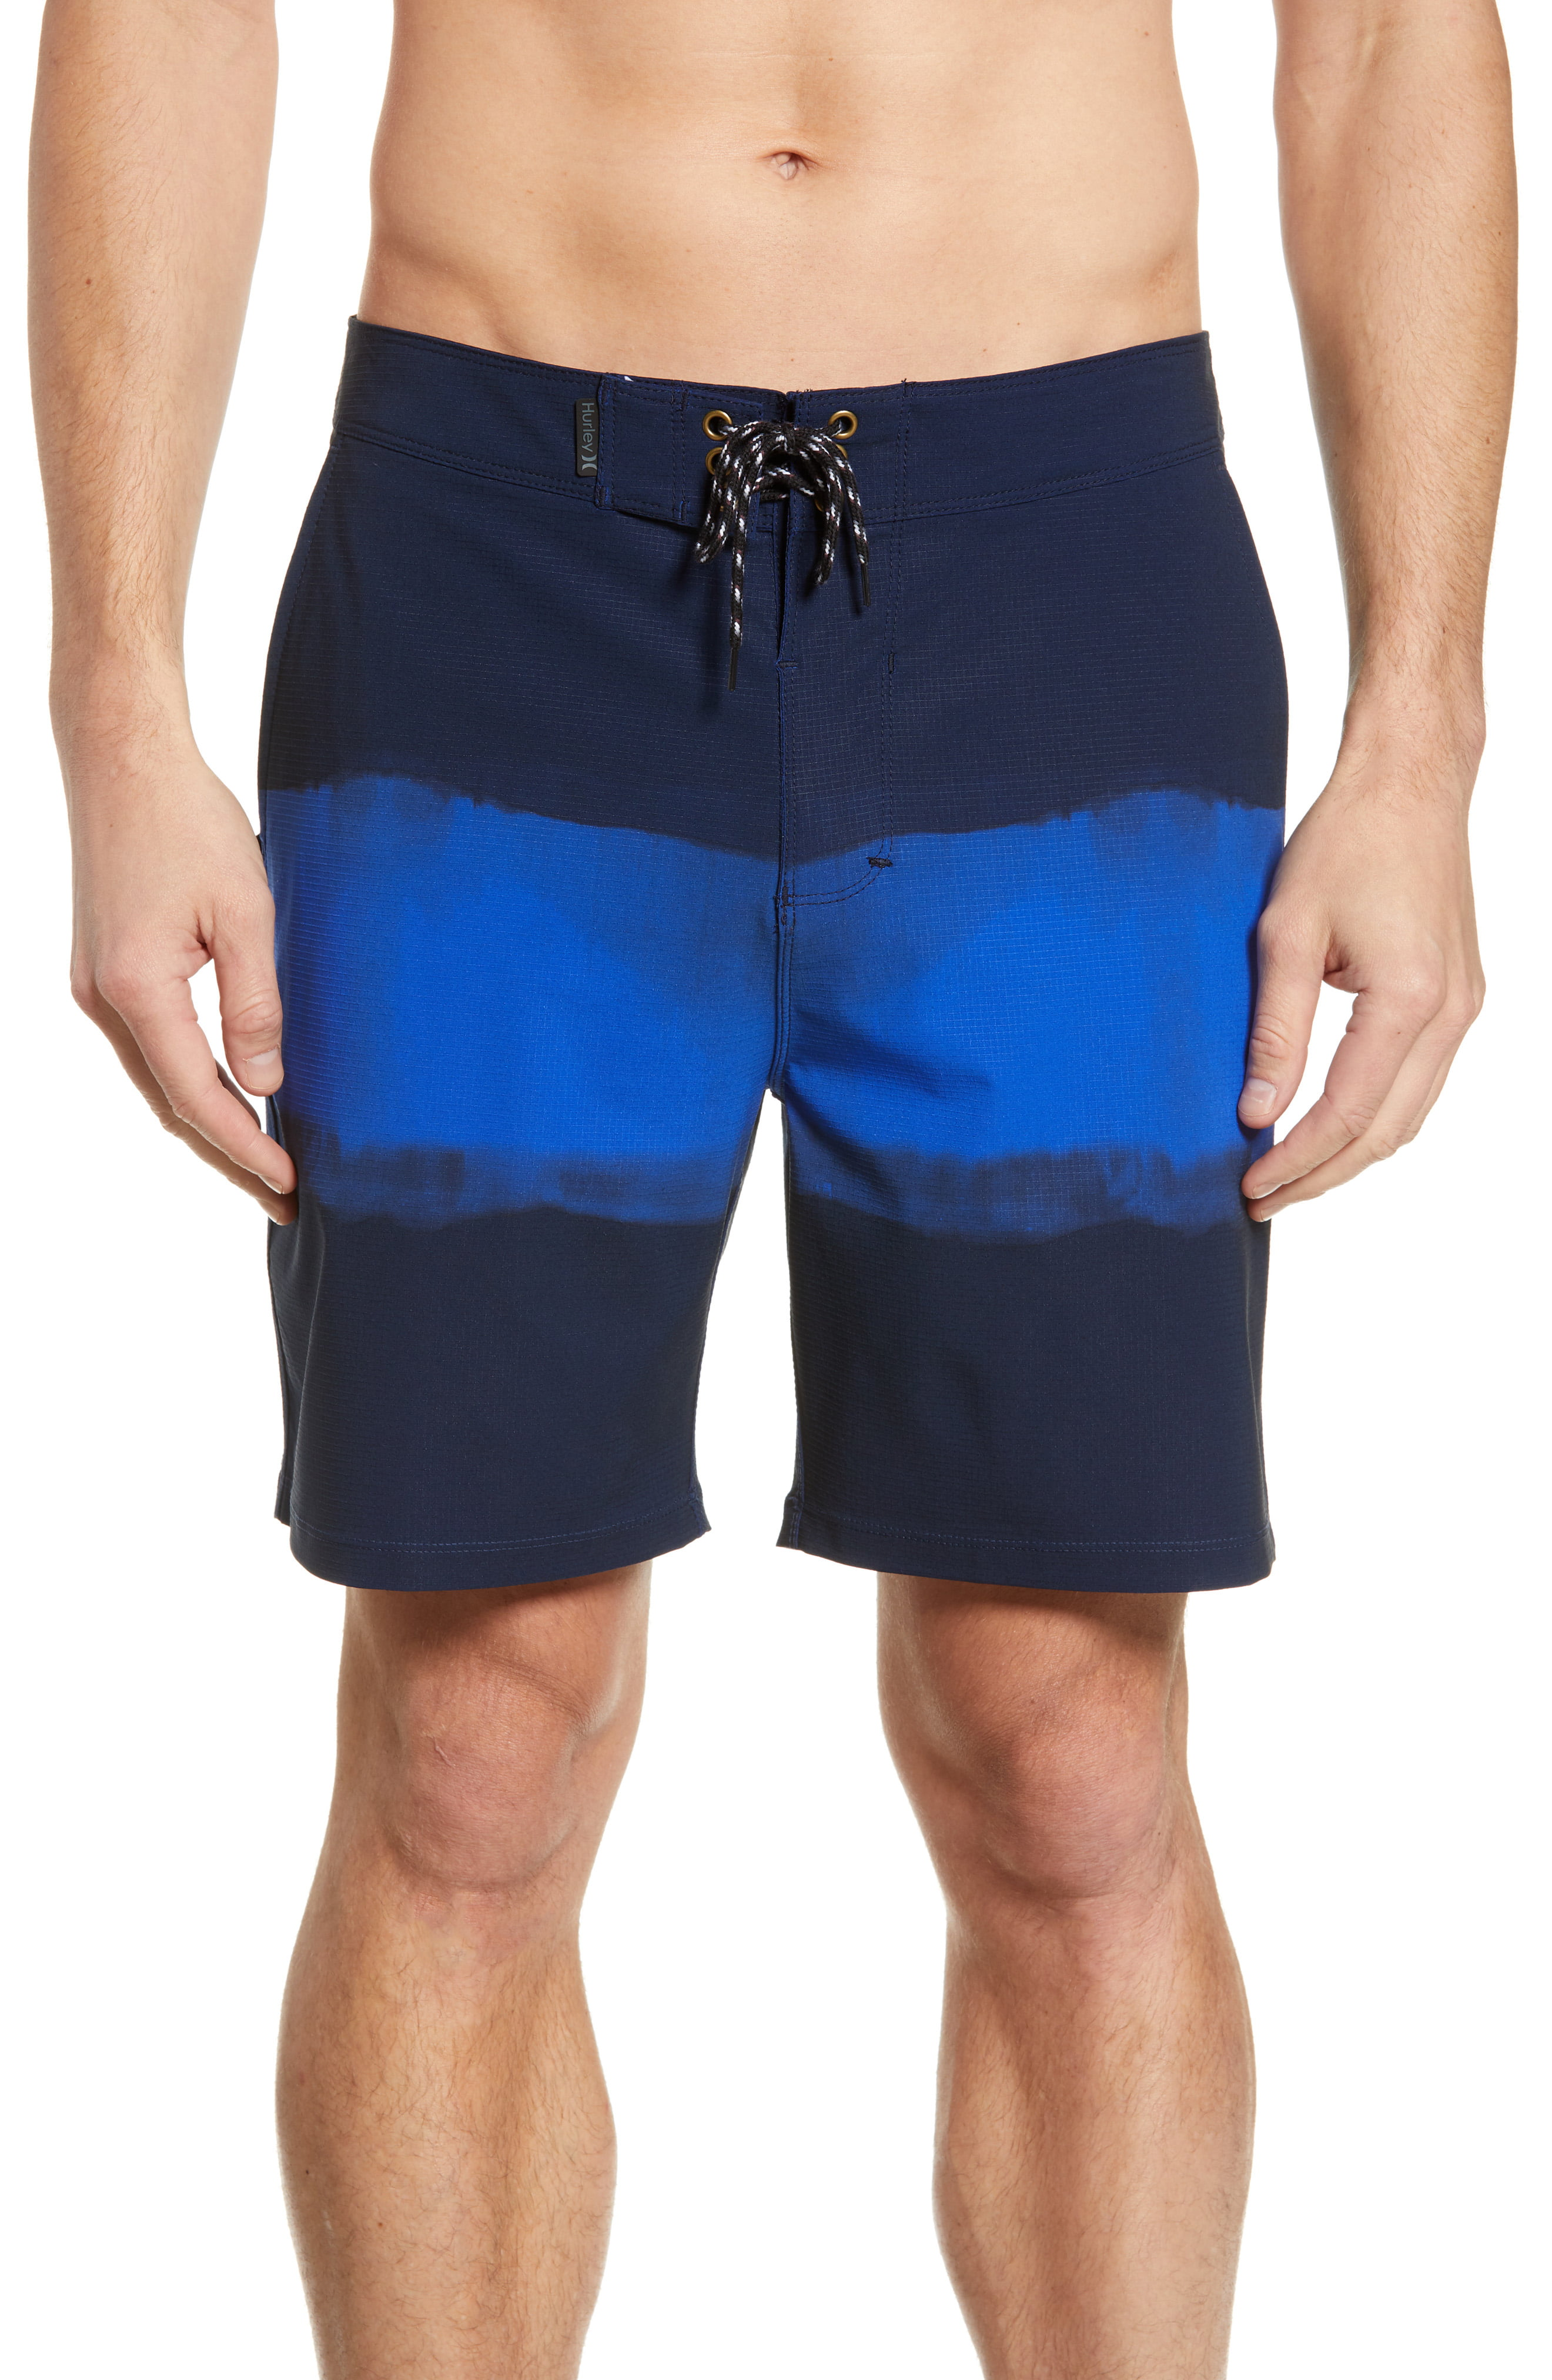 5b24c17a9d Men's Hurley Phantom Pigment Board Shorts, Size 34 - Blue | Products ...